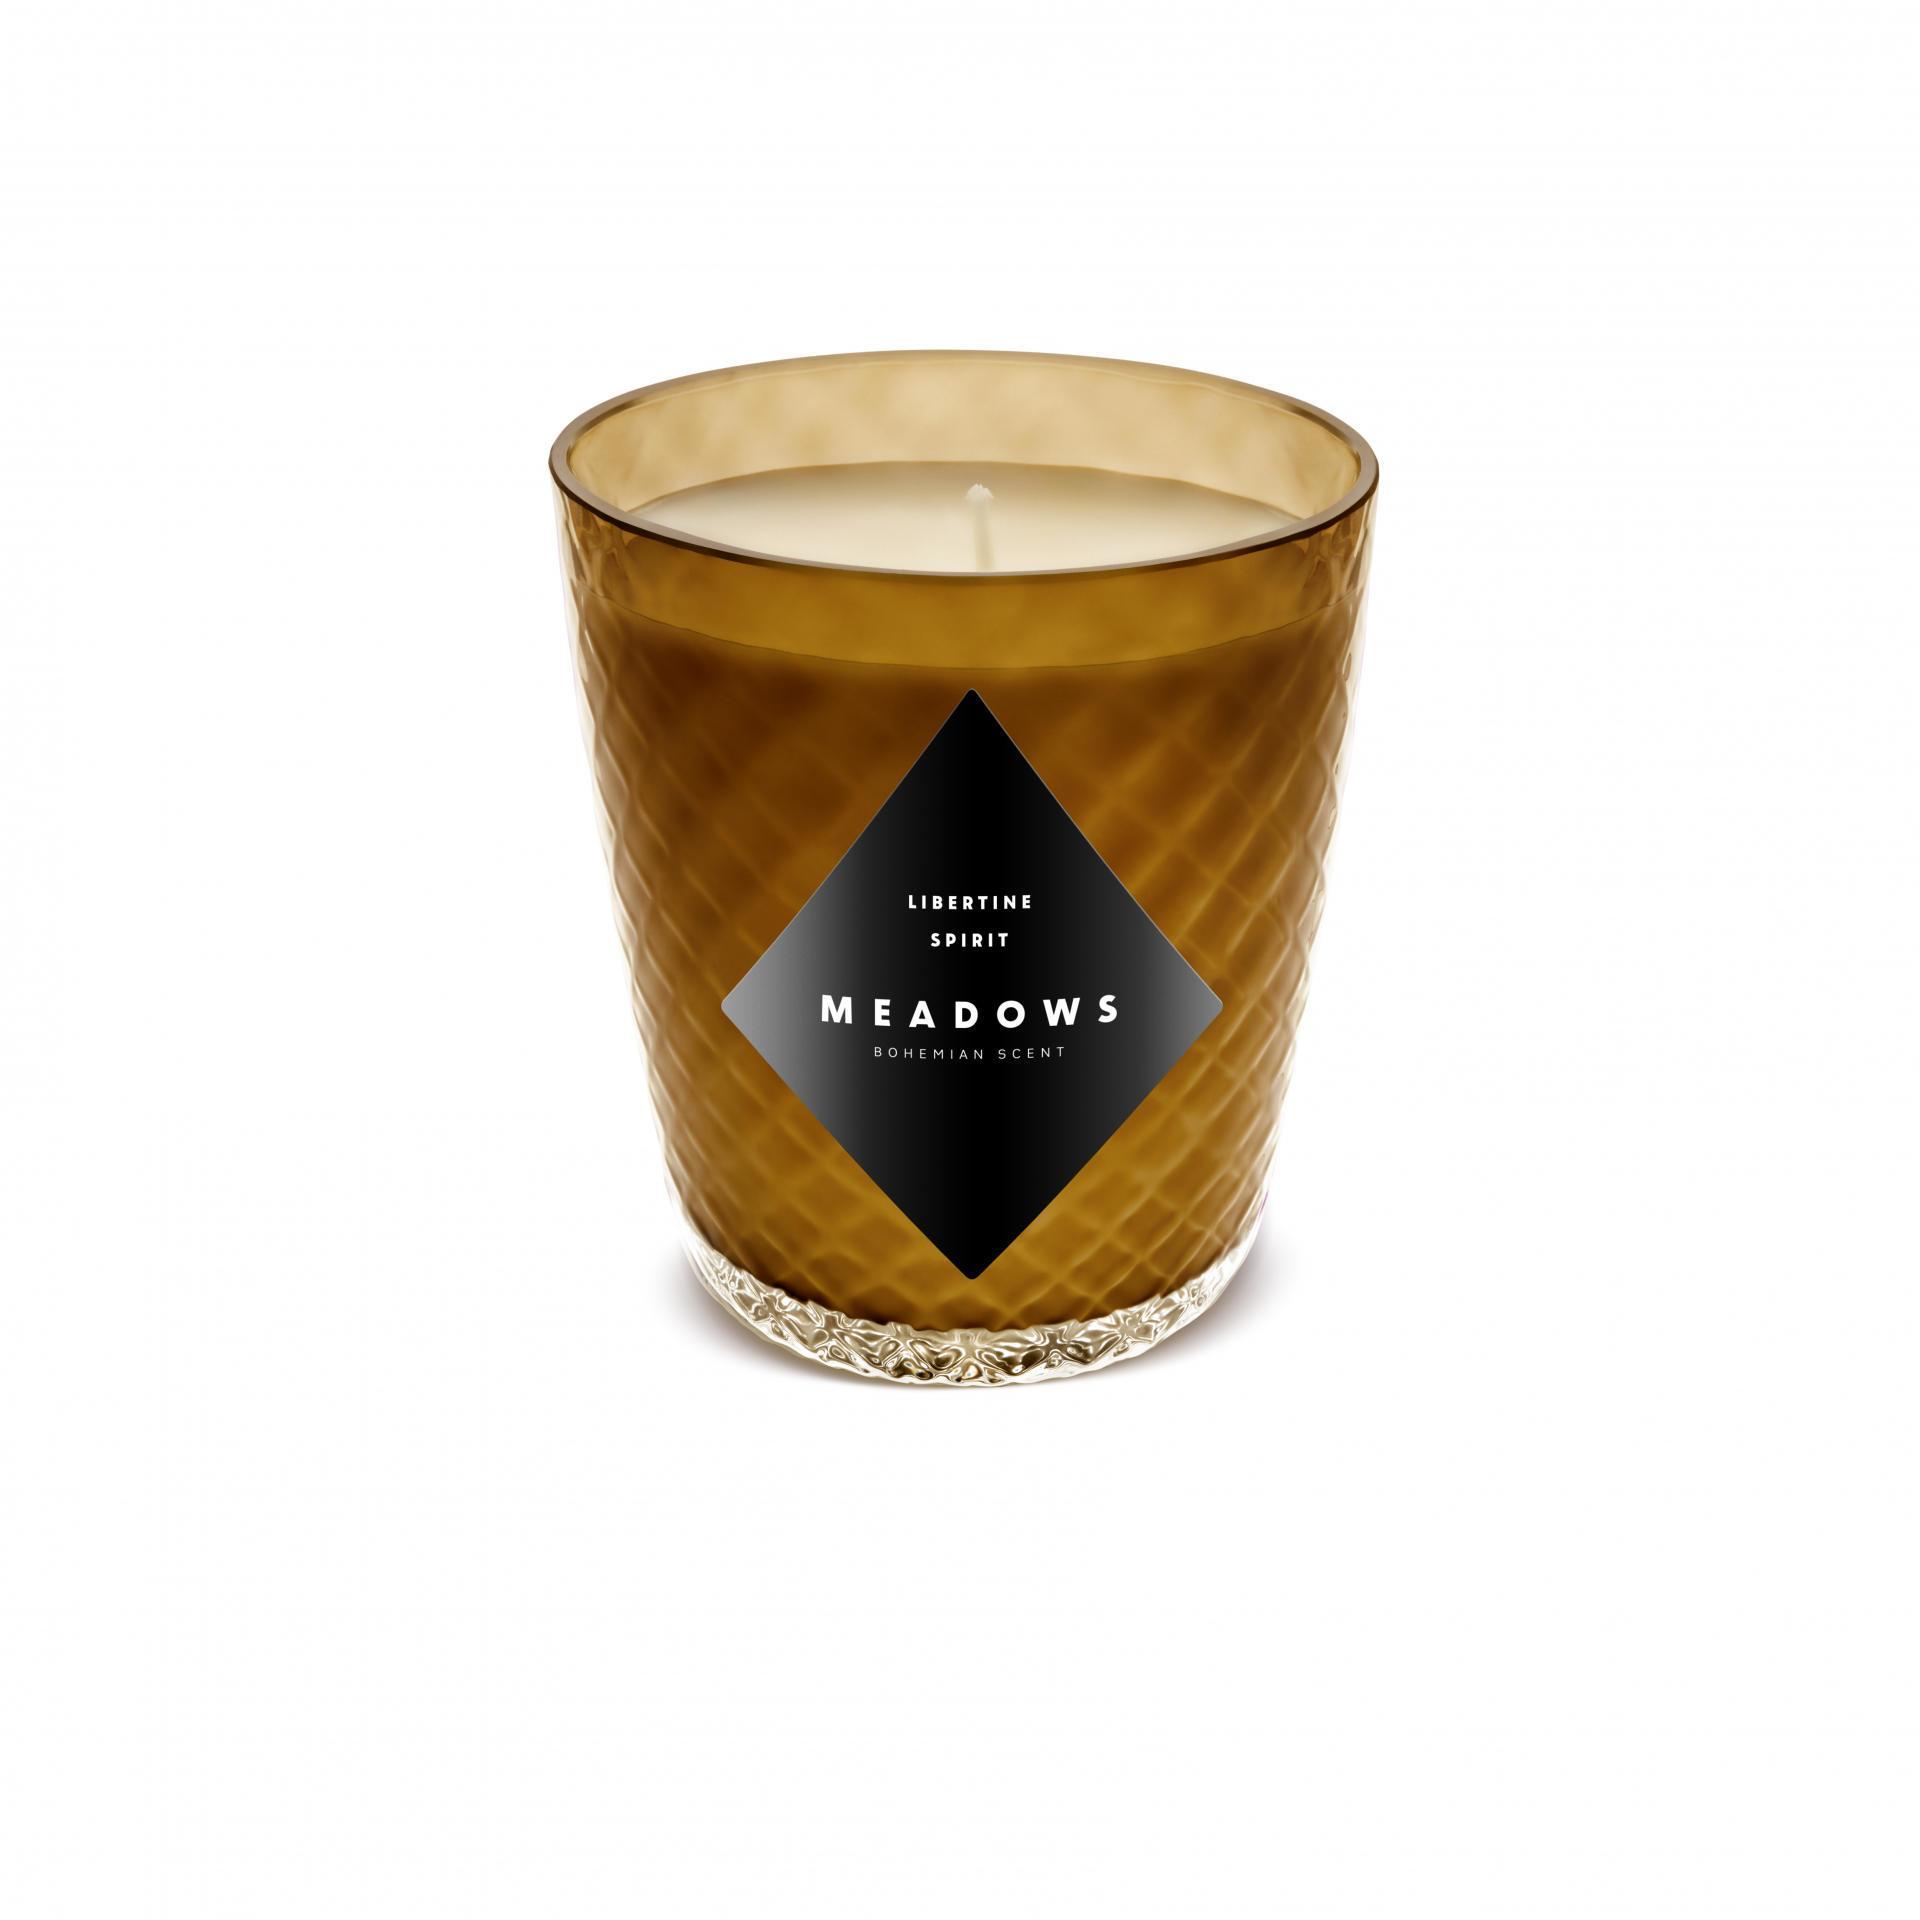 MEADOWS Luxusní vonná svíčka Libertine Spirit Mini, hnědá barva, sklo